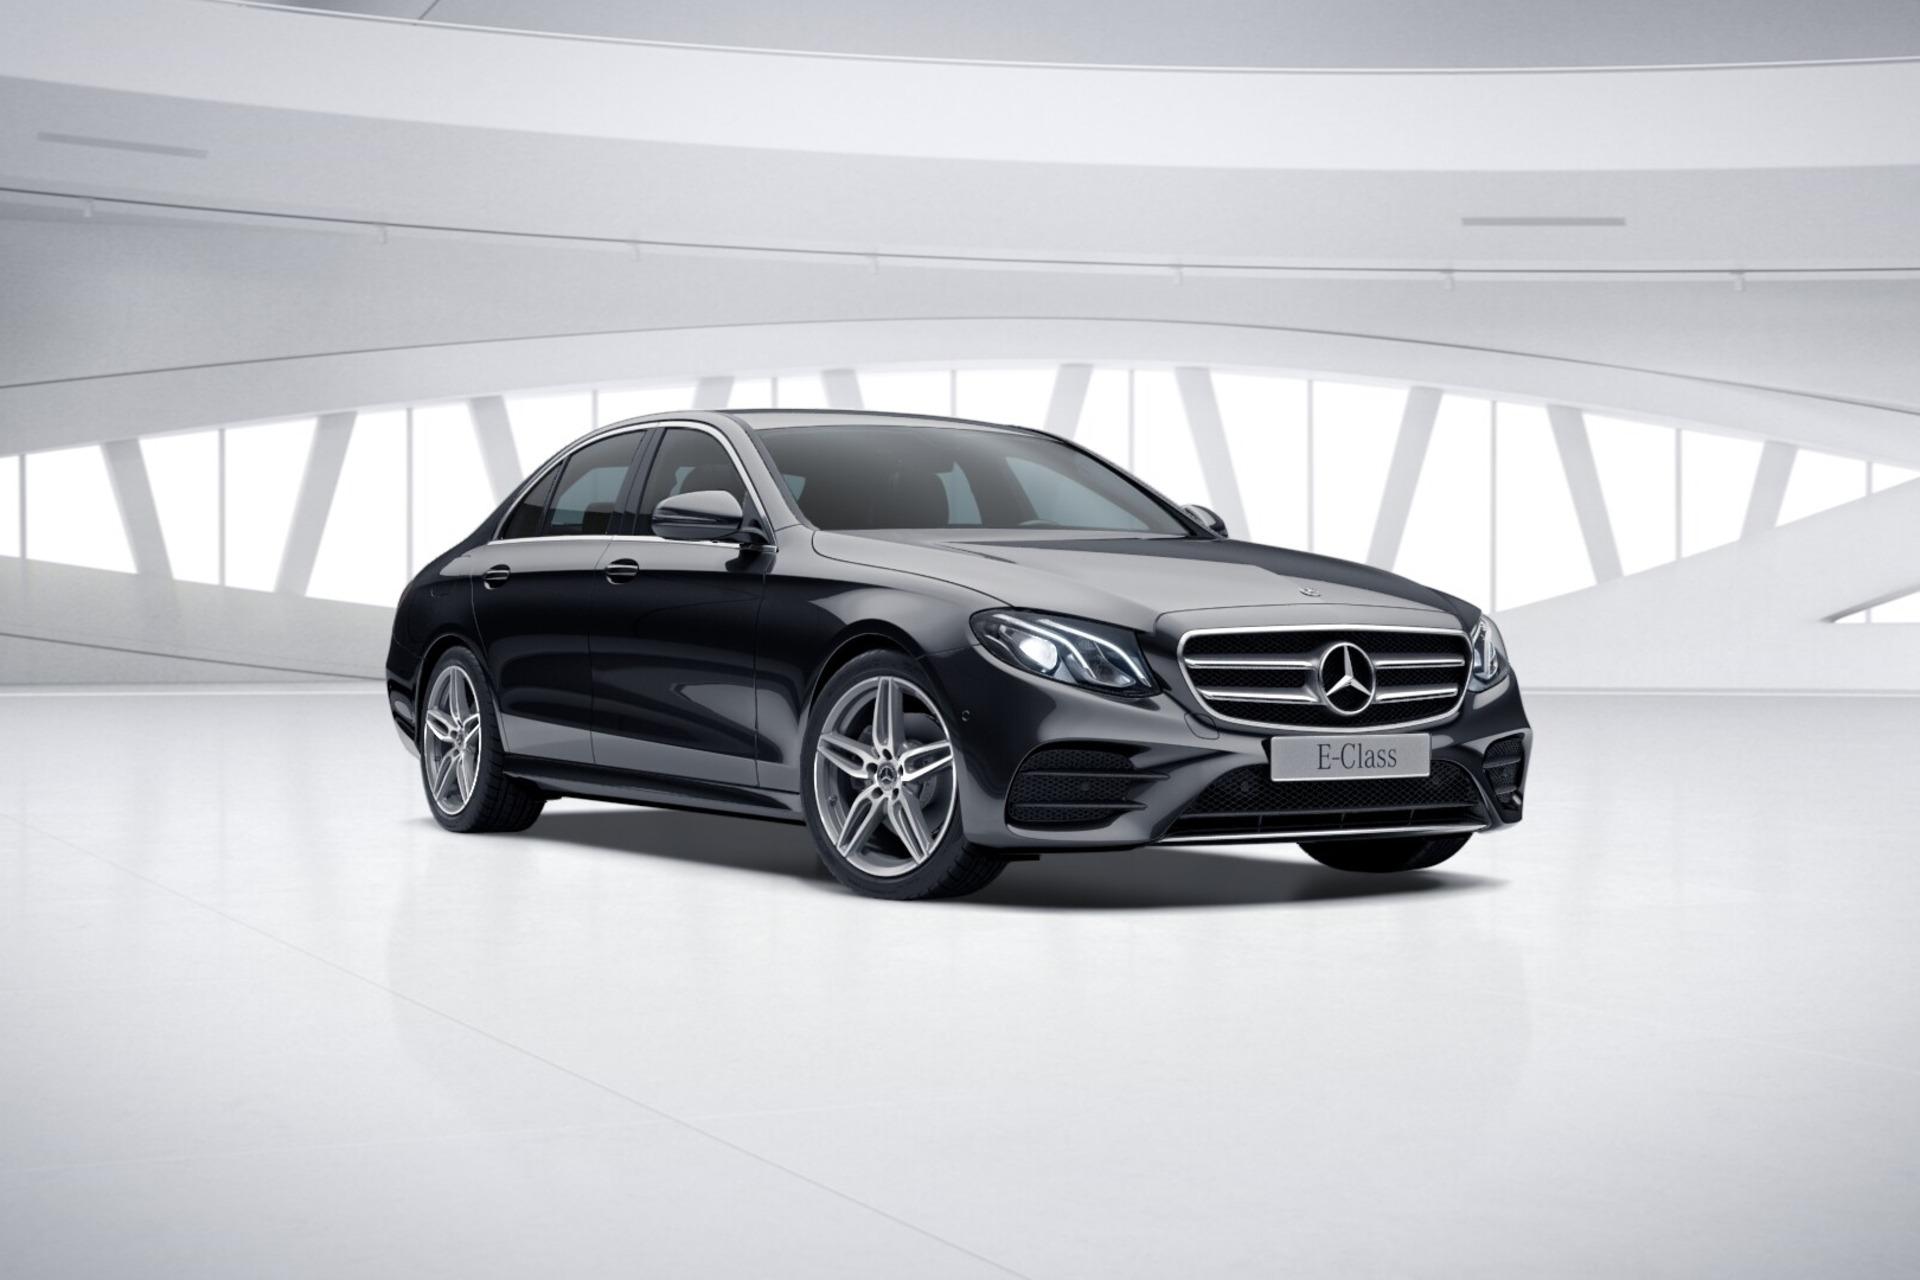 Mercedes-Benz E-Class Limousine 952611370